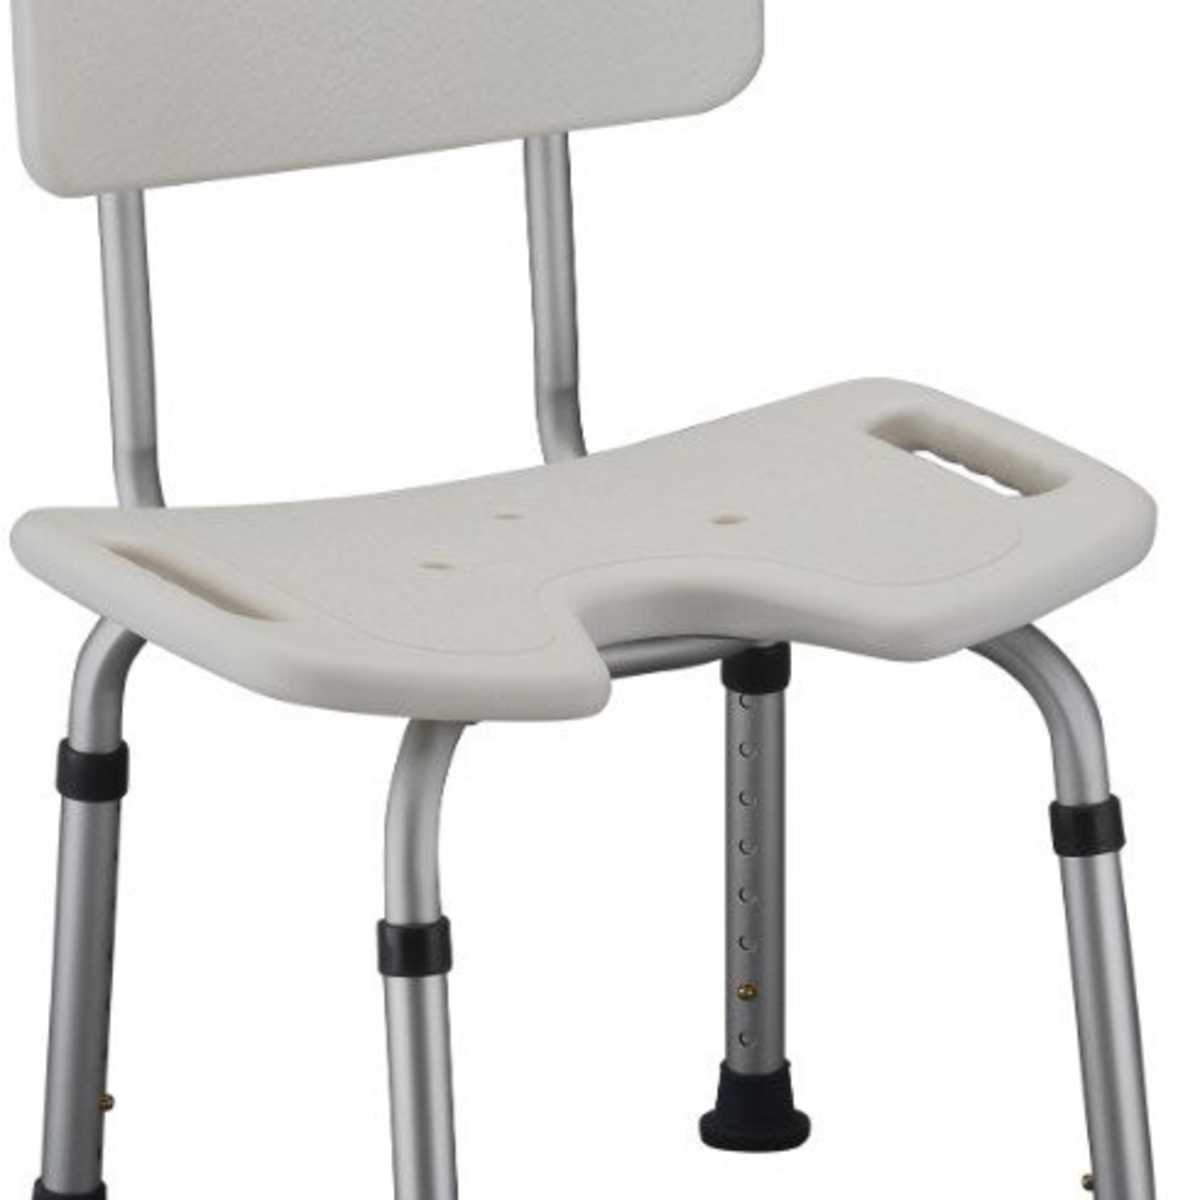 Bath Seat With Back- Hygenic U-Shape Seat